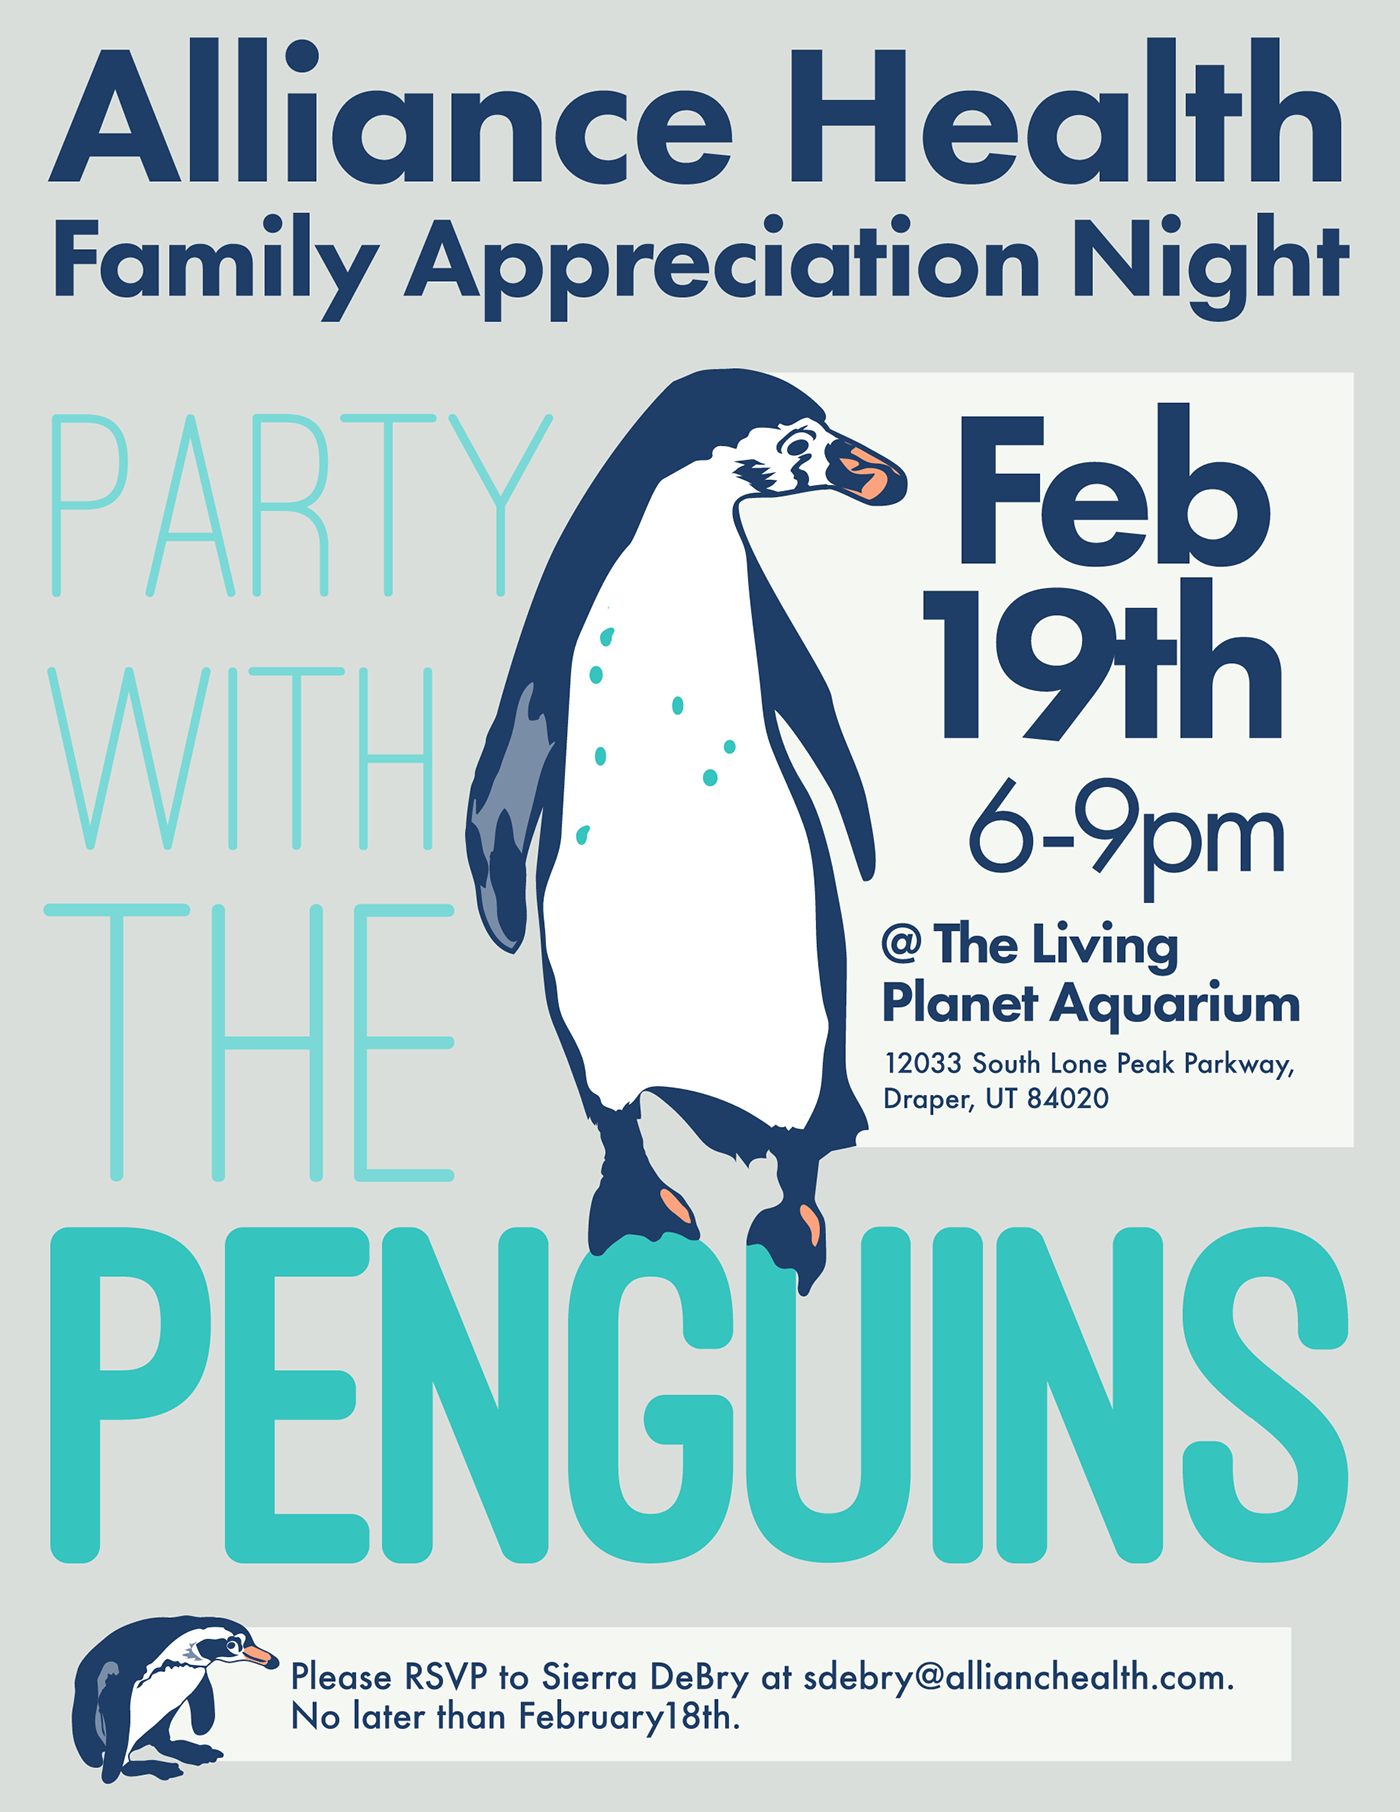 star wars penguins Events illustrations motion graphics